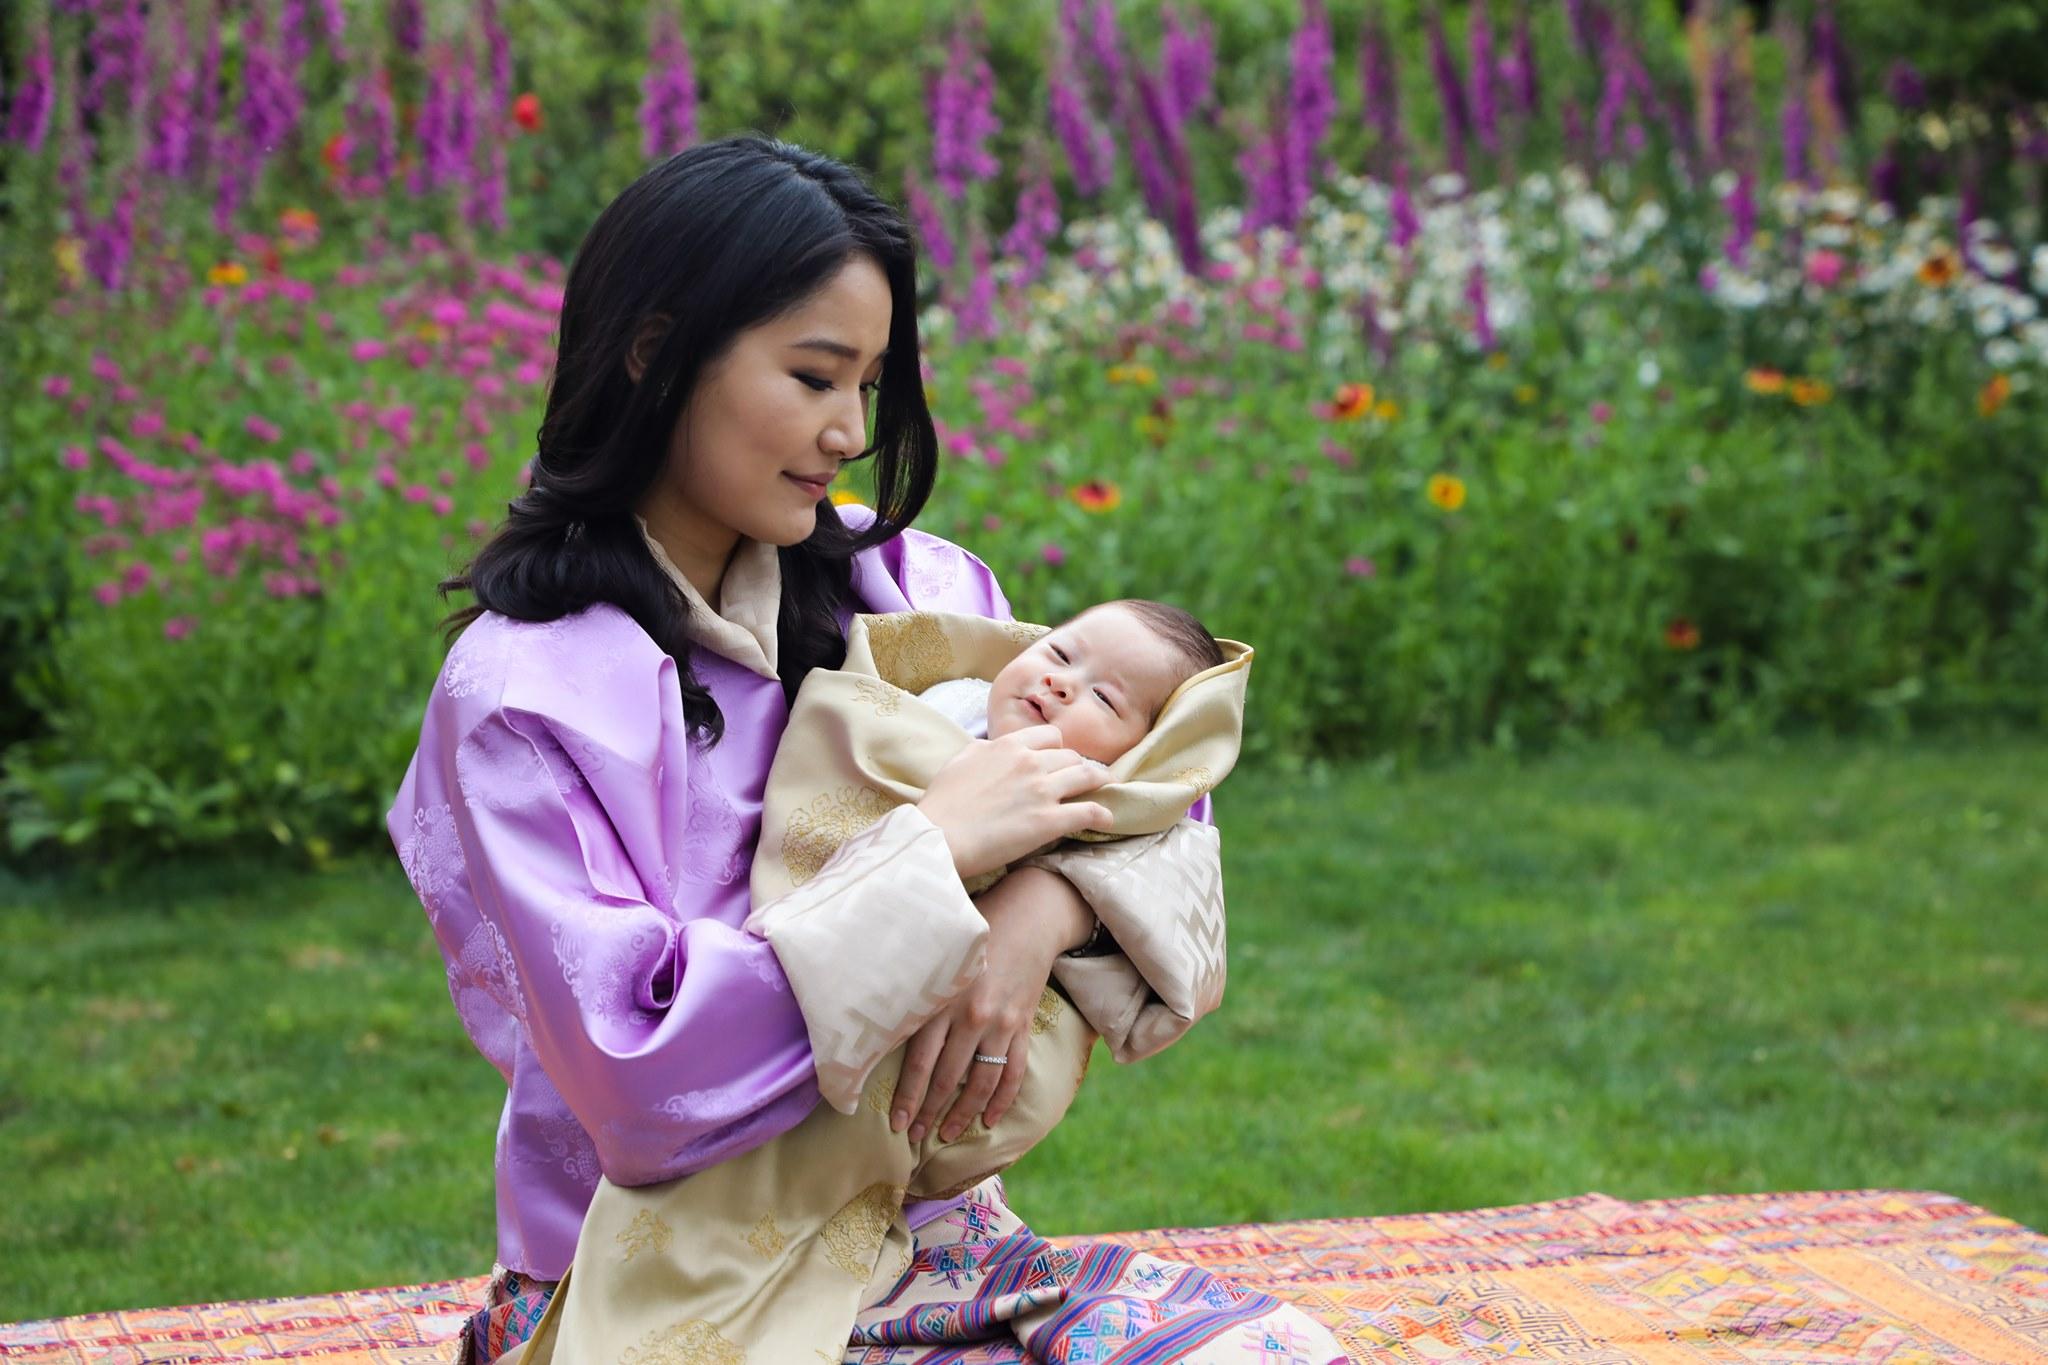 bhutan royal family 2